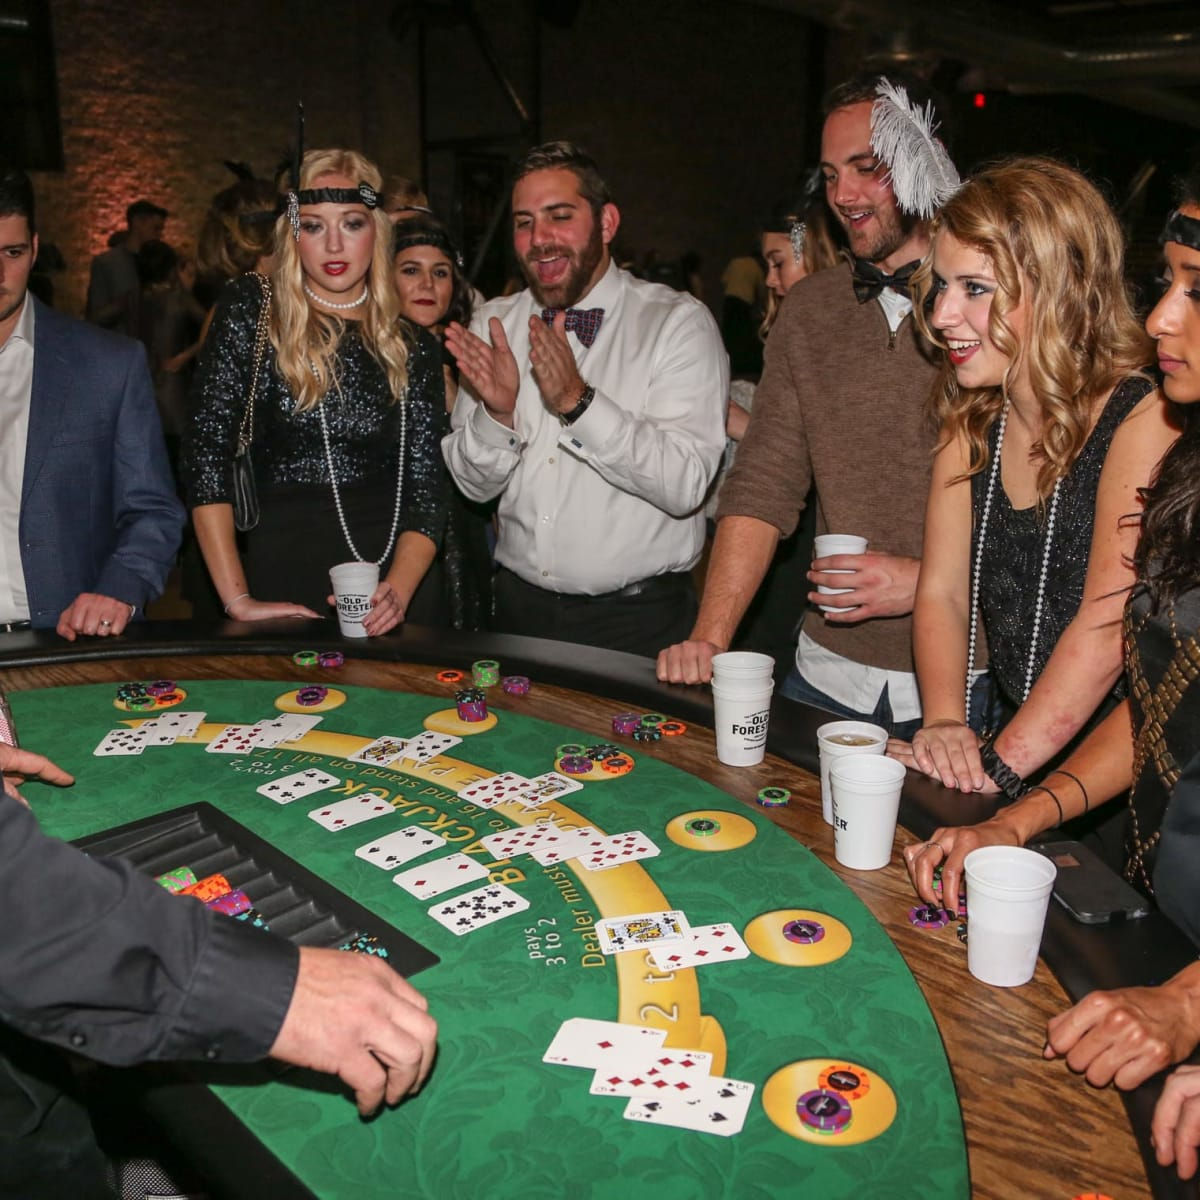 CultureMap Old Forester Bourbon Ball 2016 Blackjack Table Texas Poker Supply